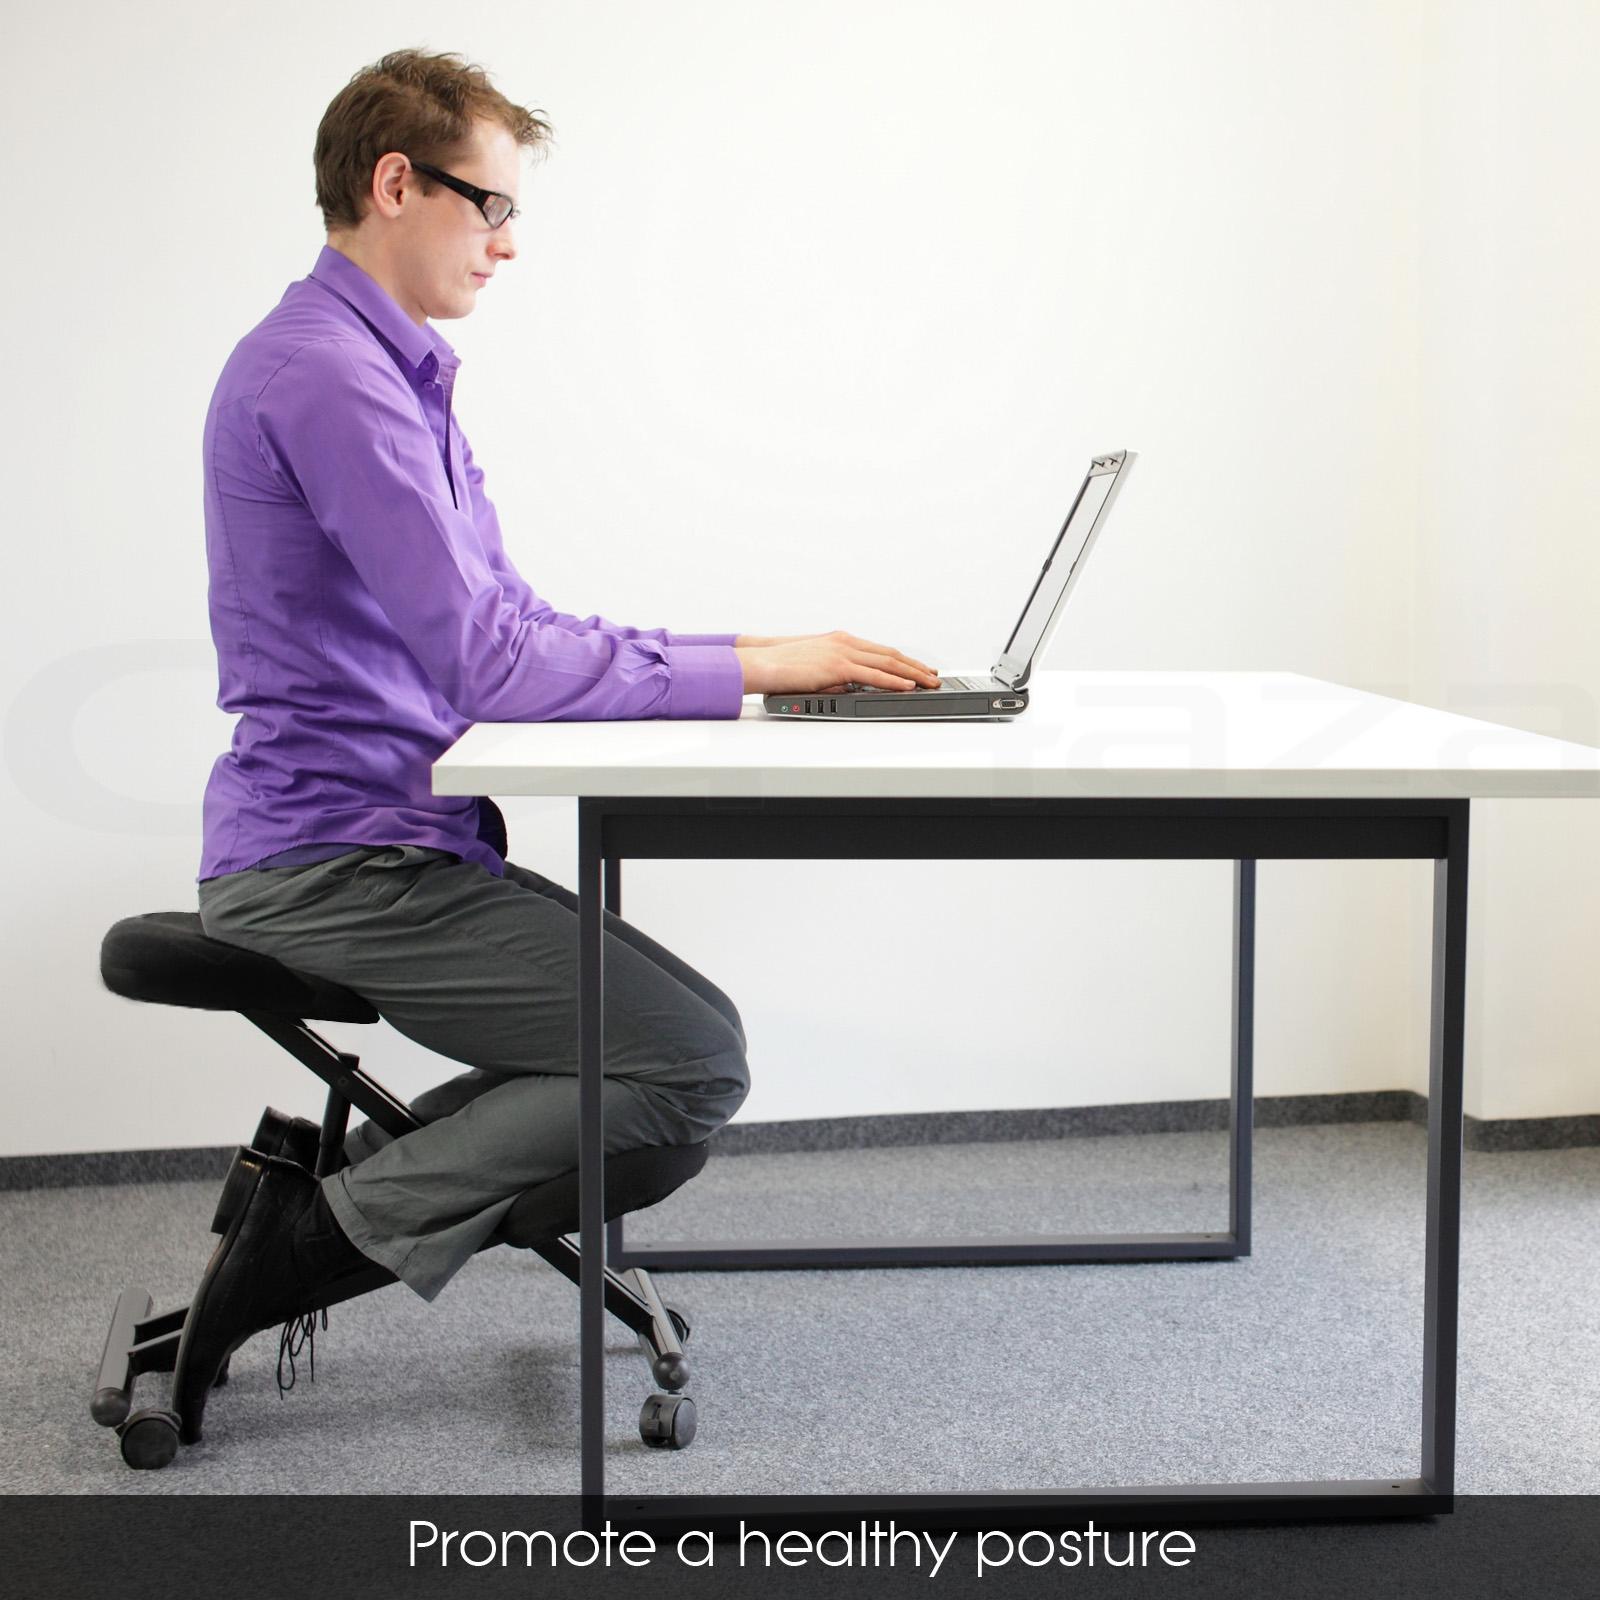 posture chair ebay power lifts adjustable kneeling office stool stretch knee yoga